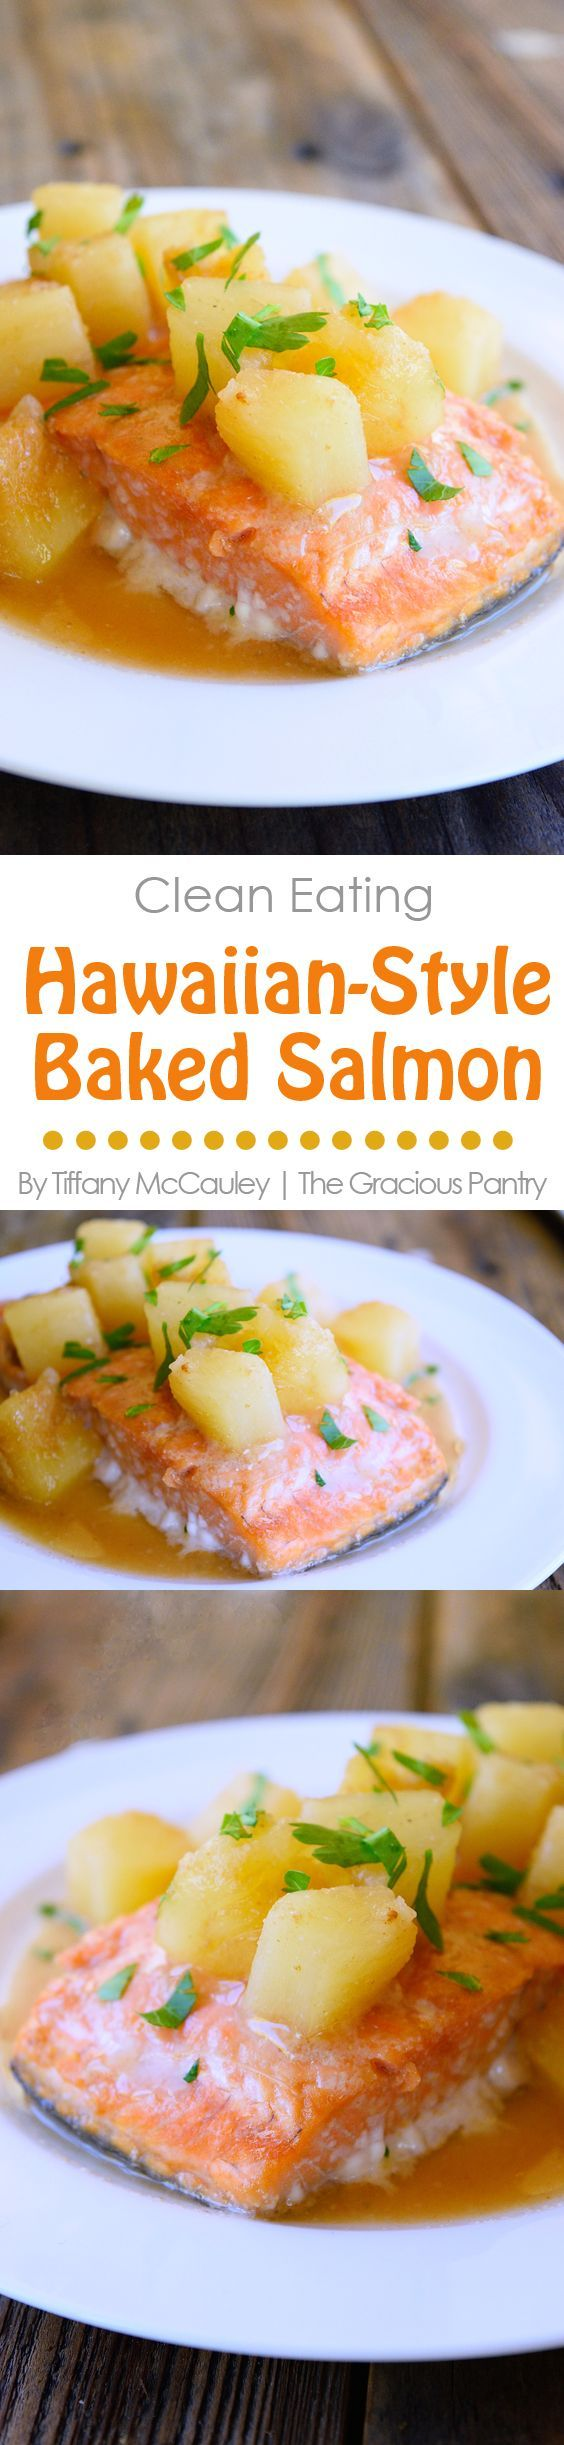 Clean Eating Recipes | Hawaiian Salmon Recipe | Healthy Seafood Recipes | Seafood Recipe | Salmon Recipe ~ https://www.thegraciouspantry.com